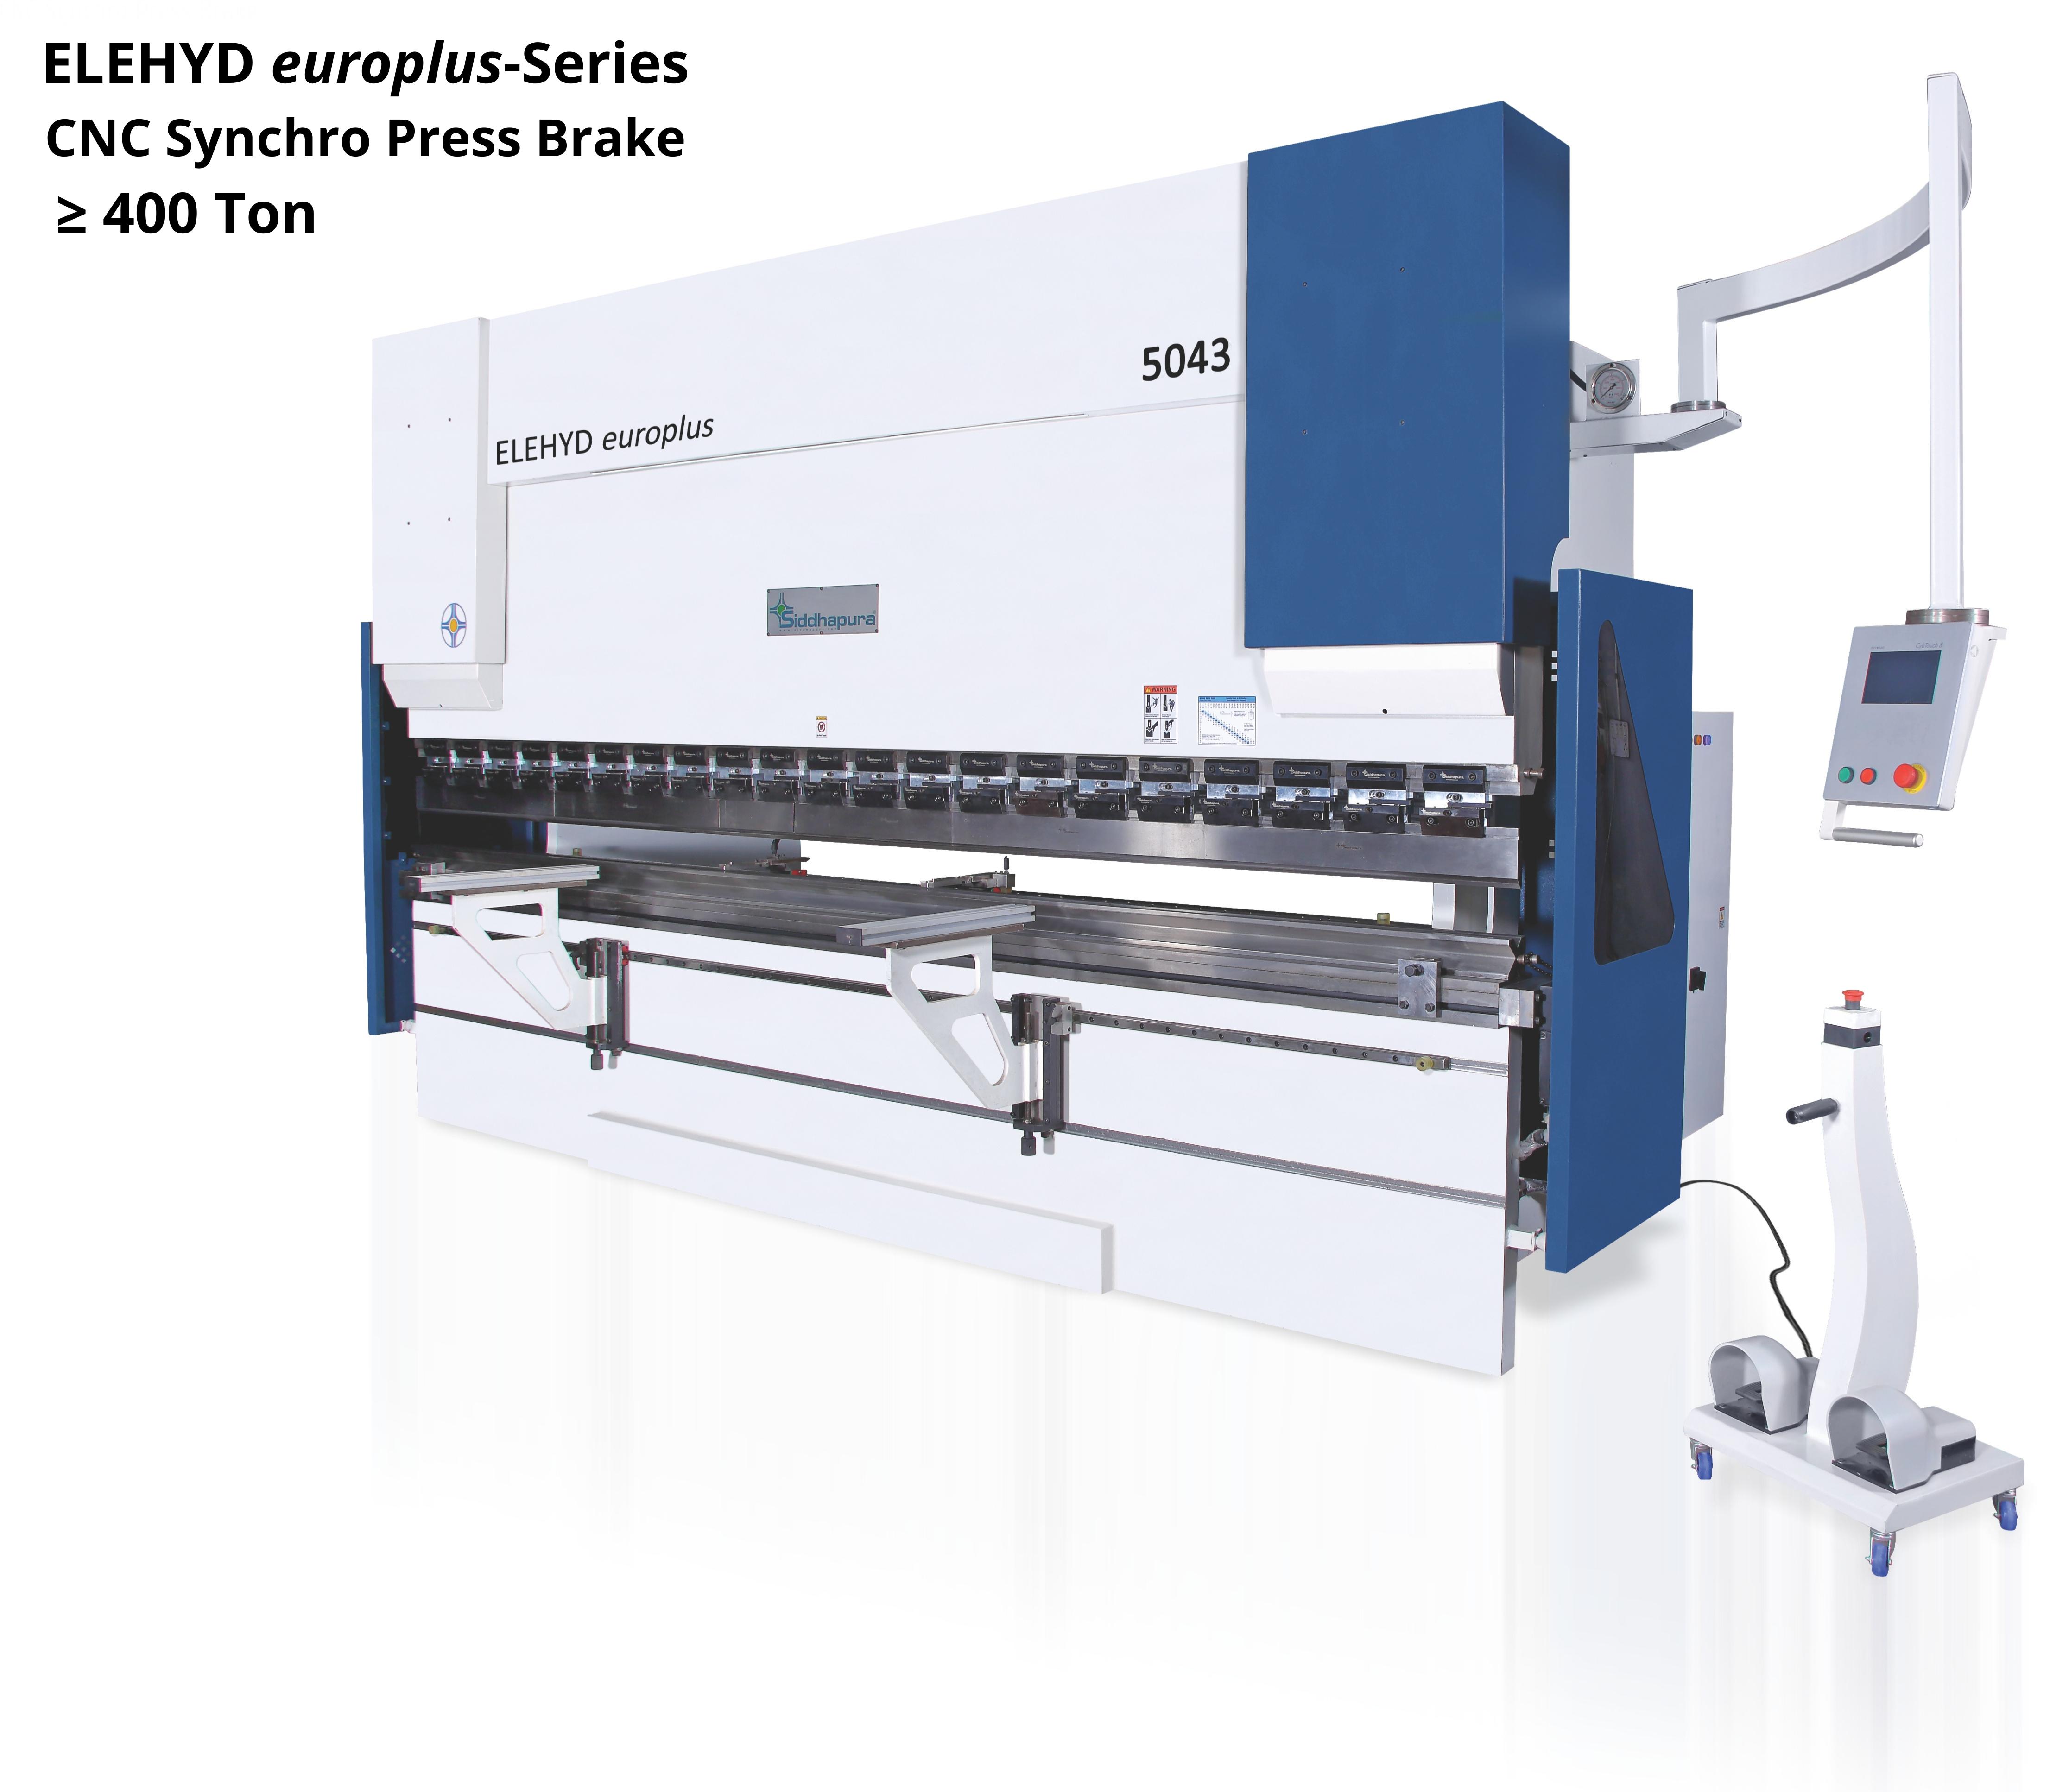 ELEHYD europlus-Series Cnc Synchro Press Brake